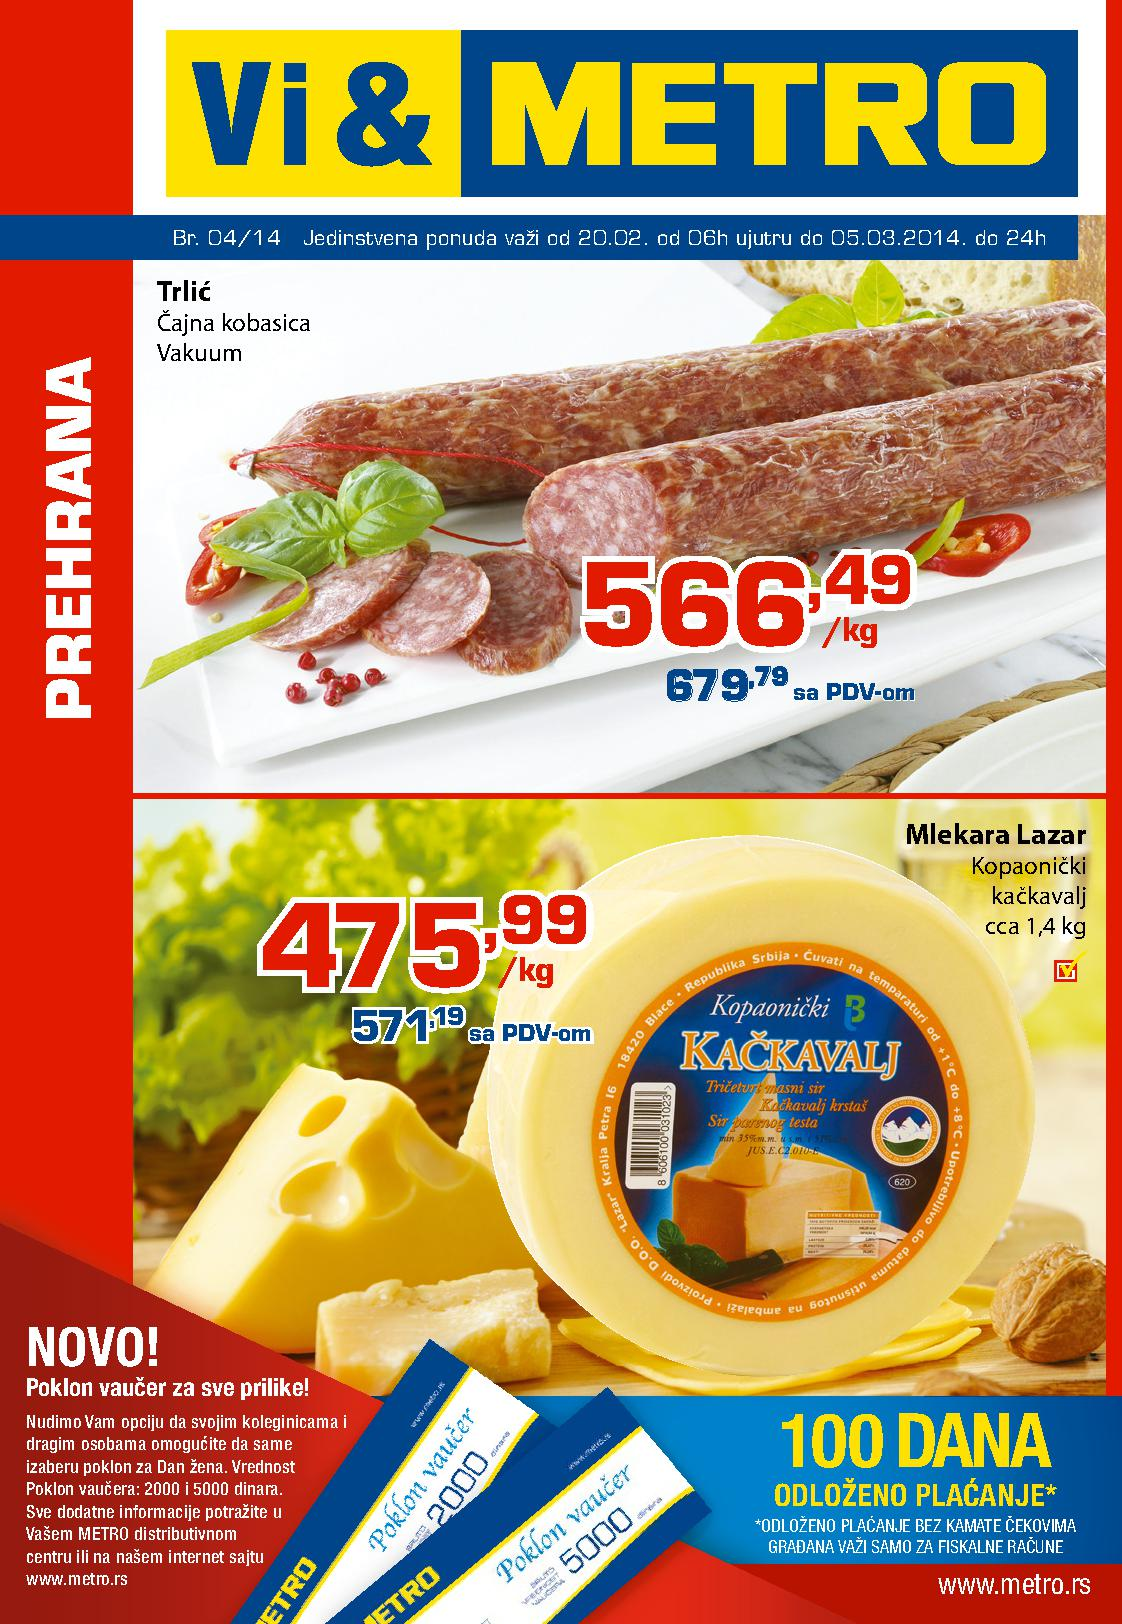 Metro katalog prehraana po odličnoj ceni za vas